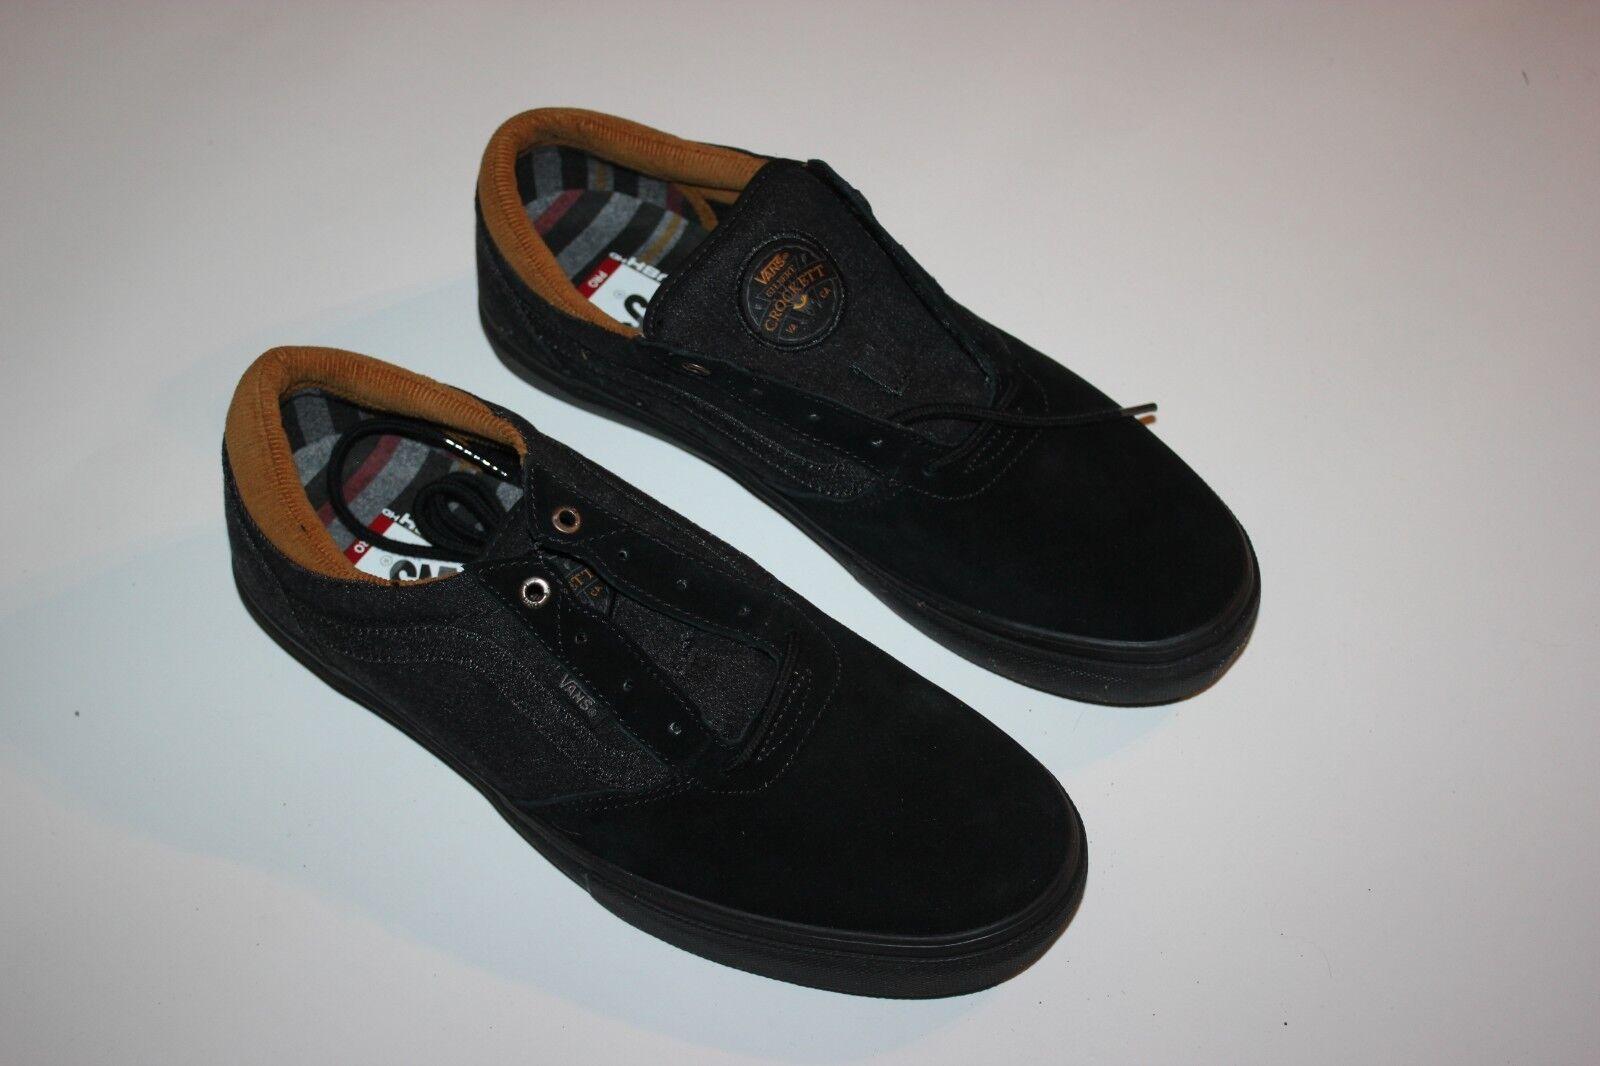 pennino pennino pennino furgoni gilbert crockett (jeans nero / black pattinare scarpe mens dimensioni 7 ff3bfe